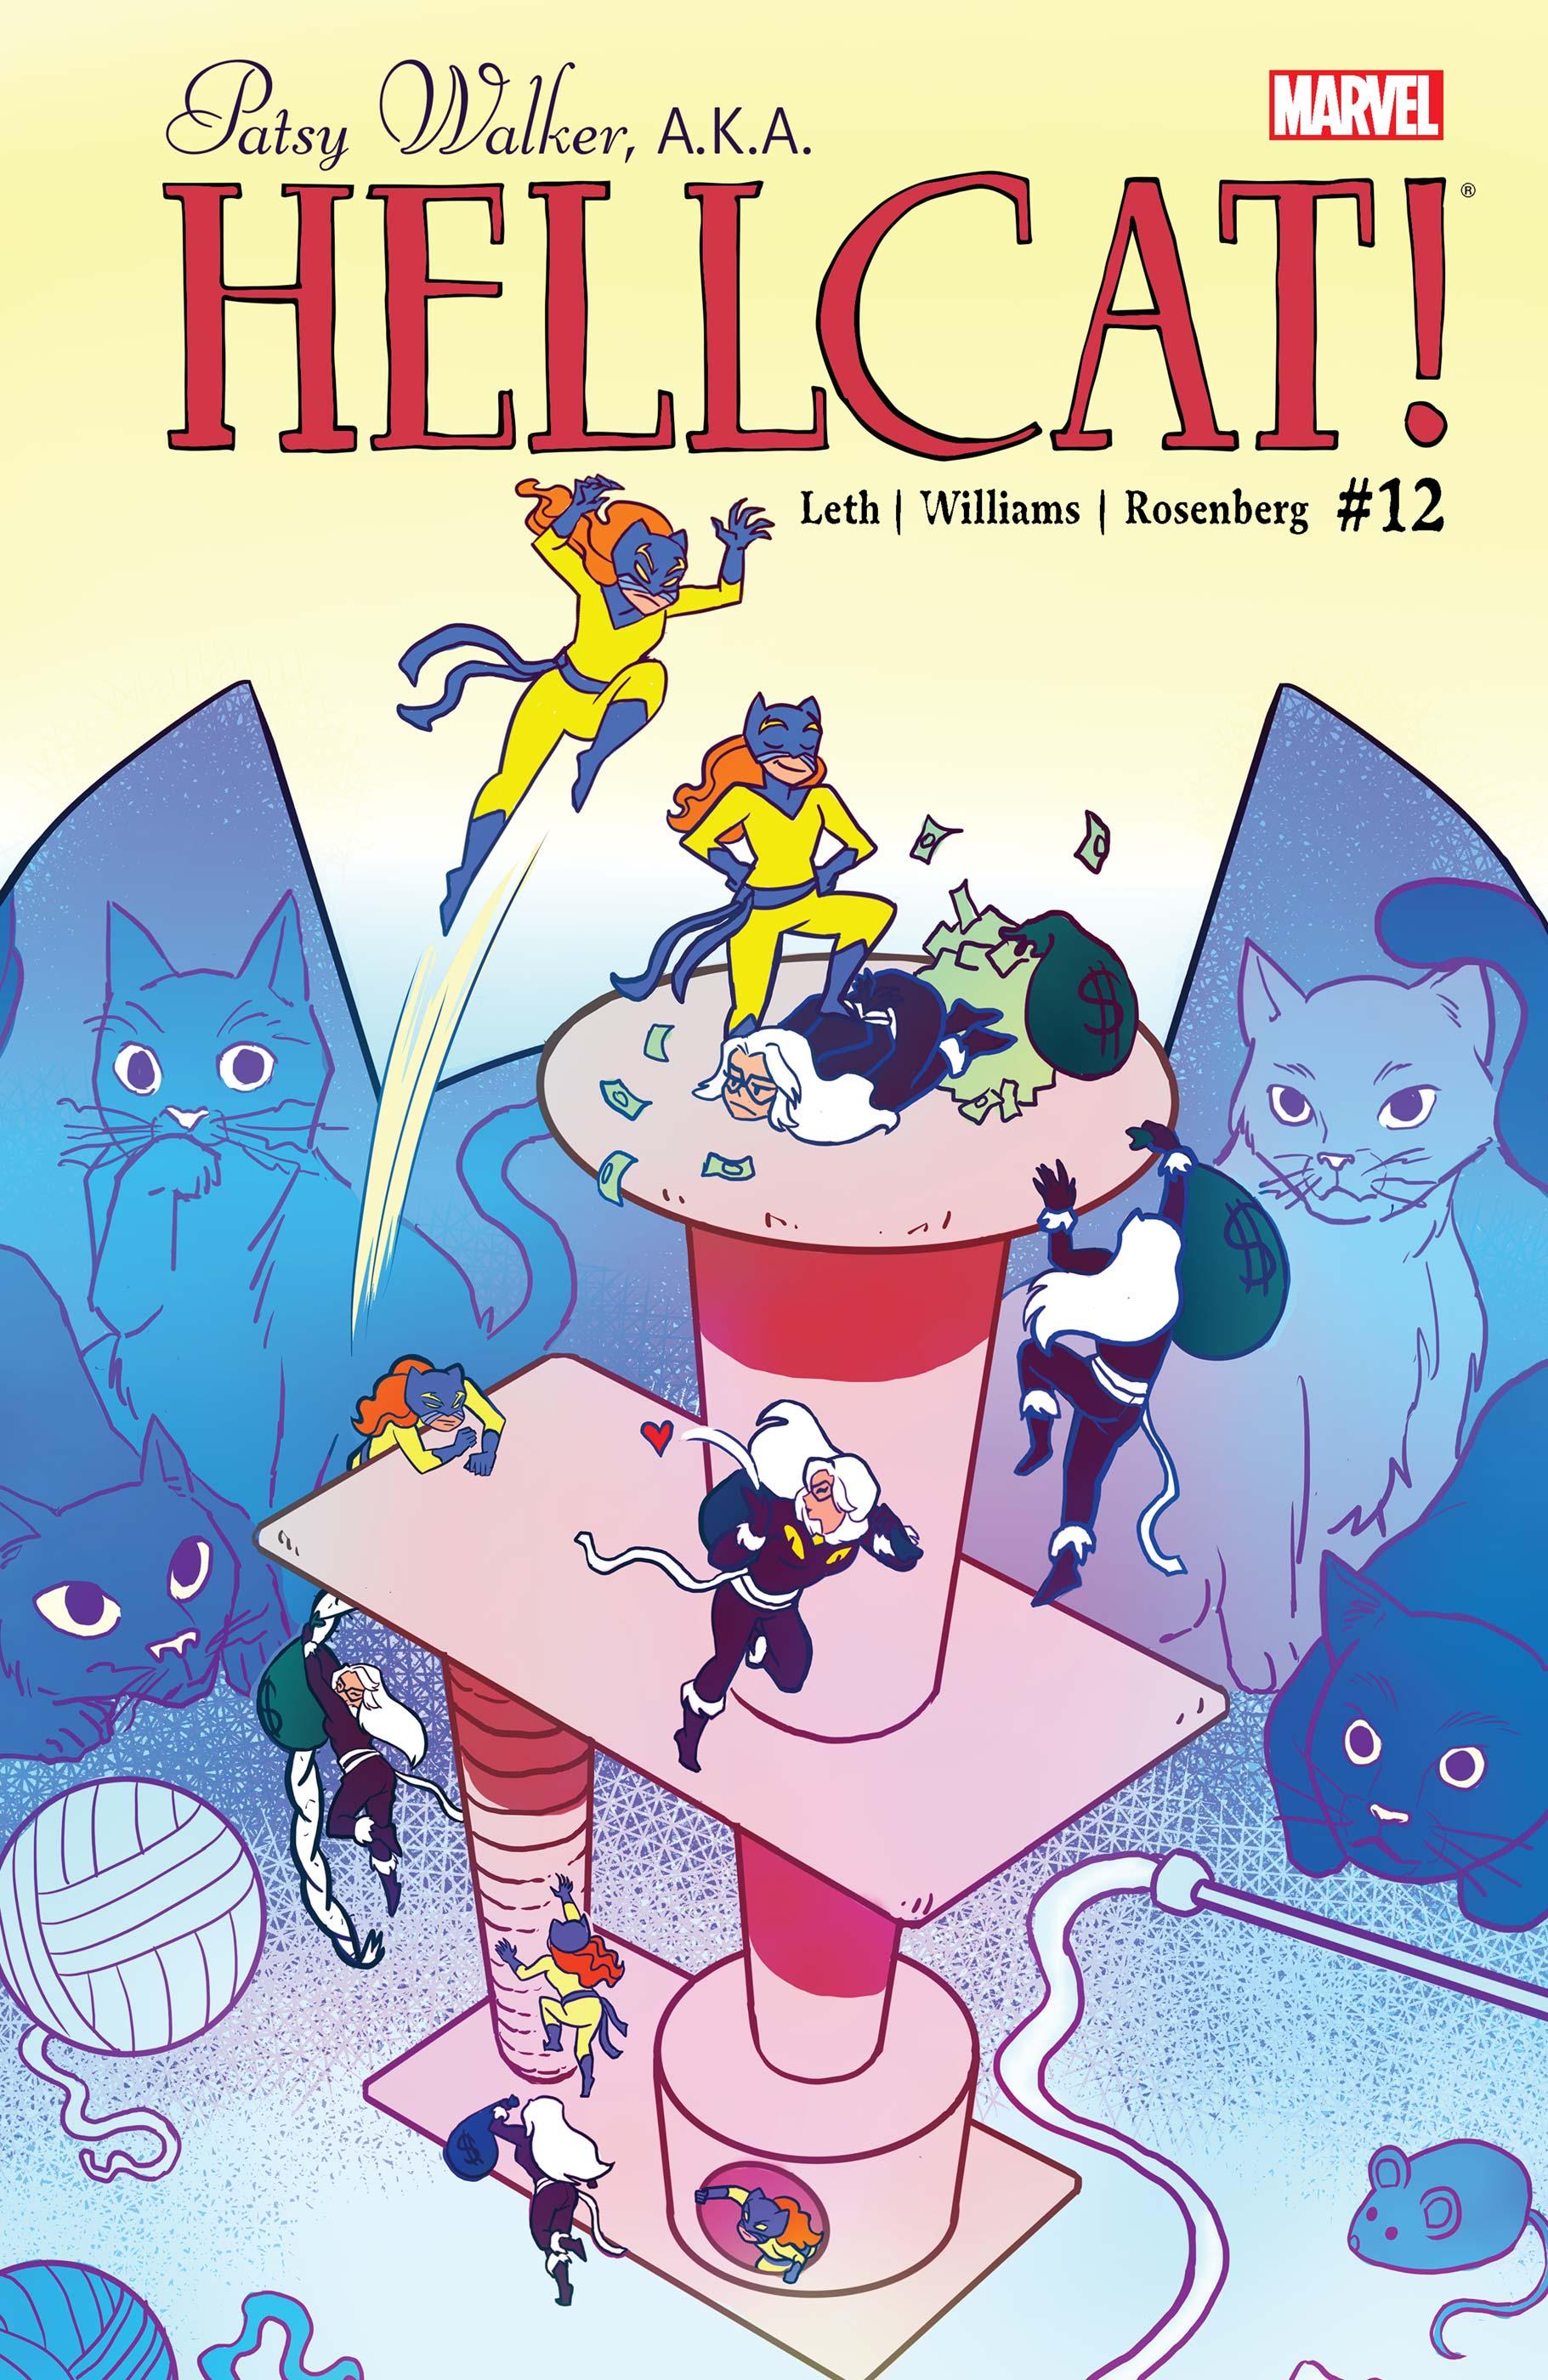 Patsy Walker, A.K.A. Hellcat! (2015) #12